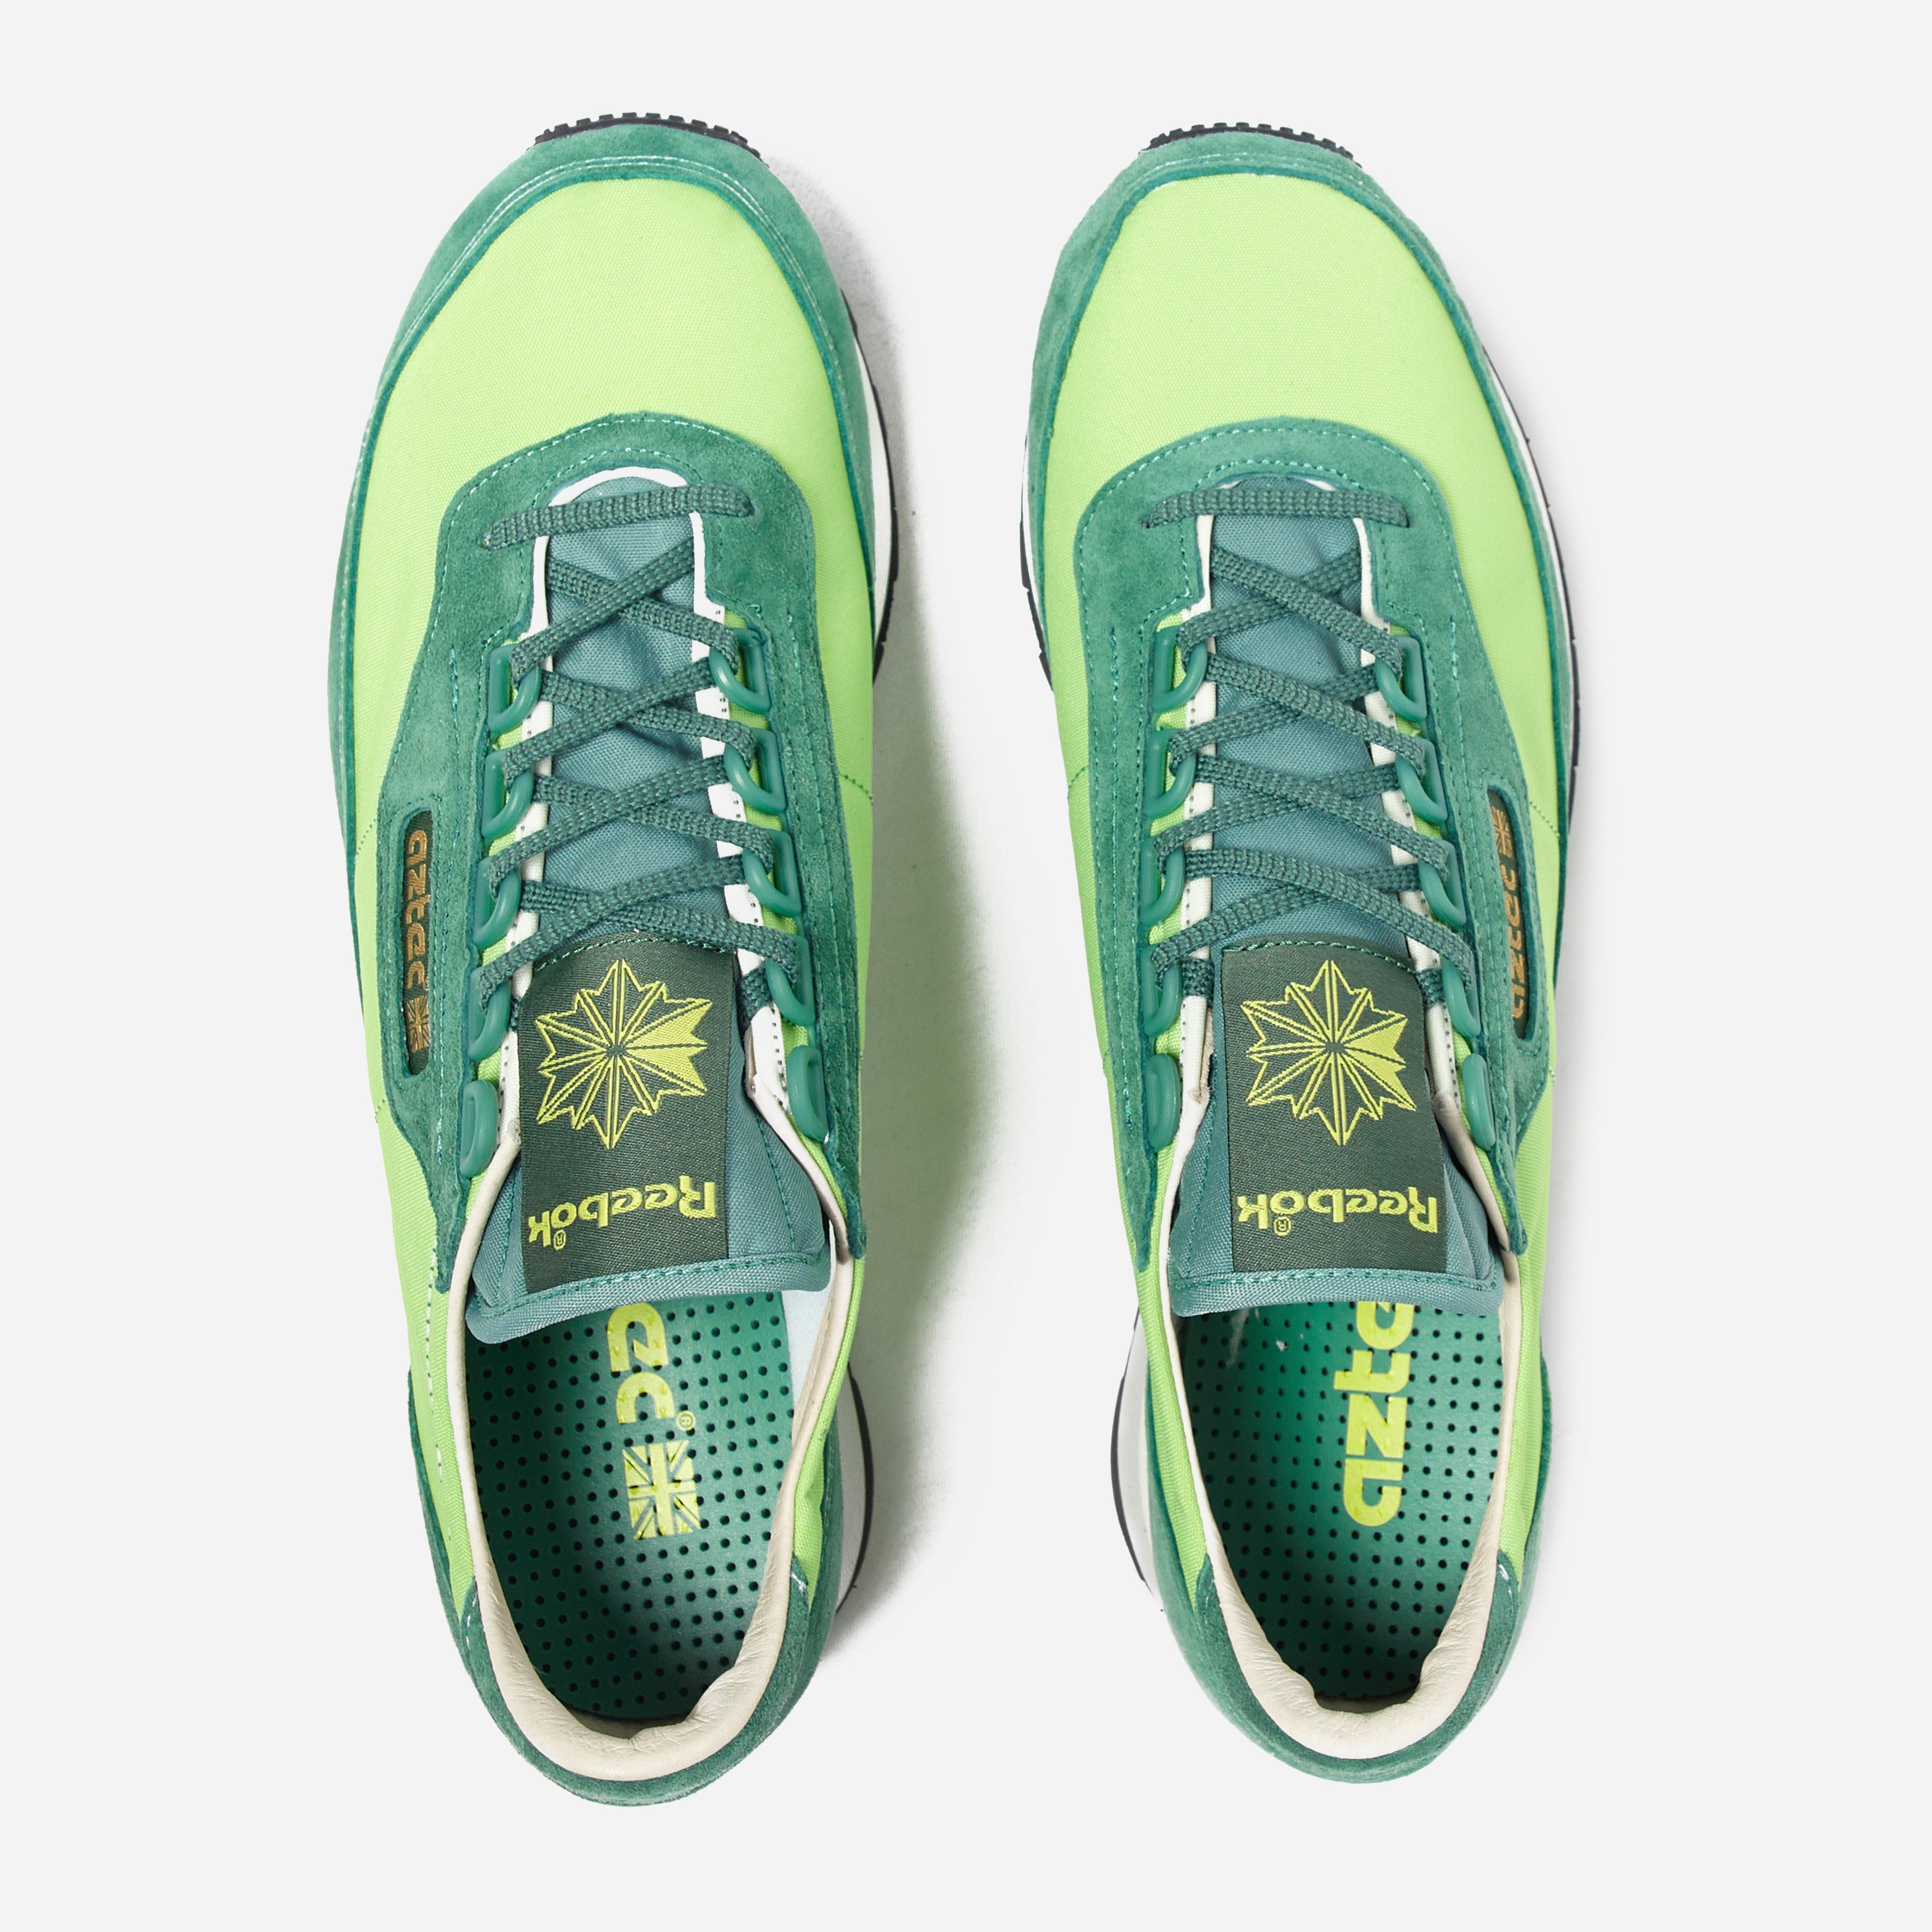 7807512c5fbfe0 Lyst - Reebok Aztec Runner in Green for Men